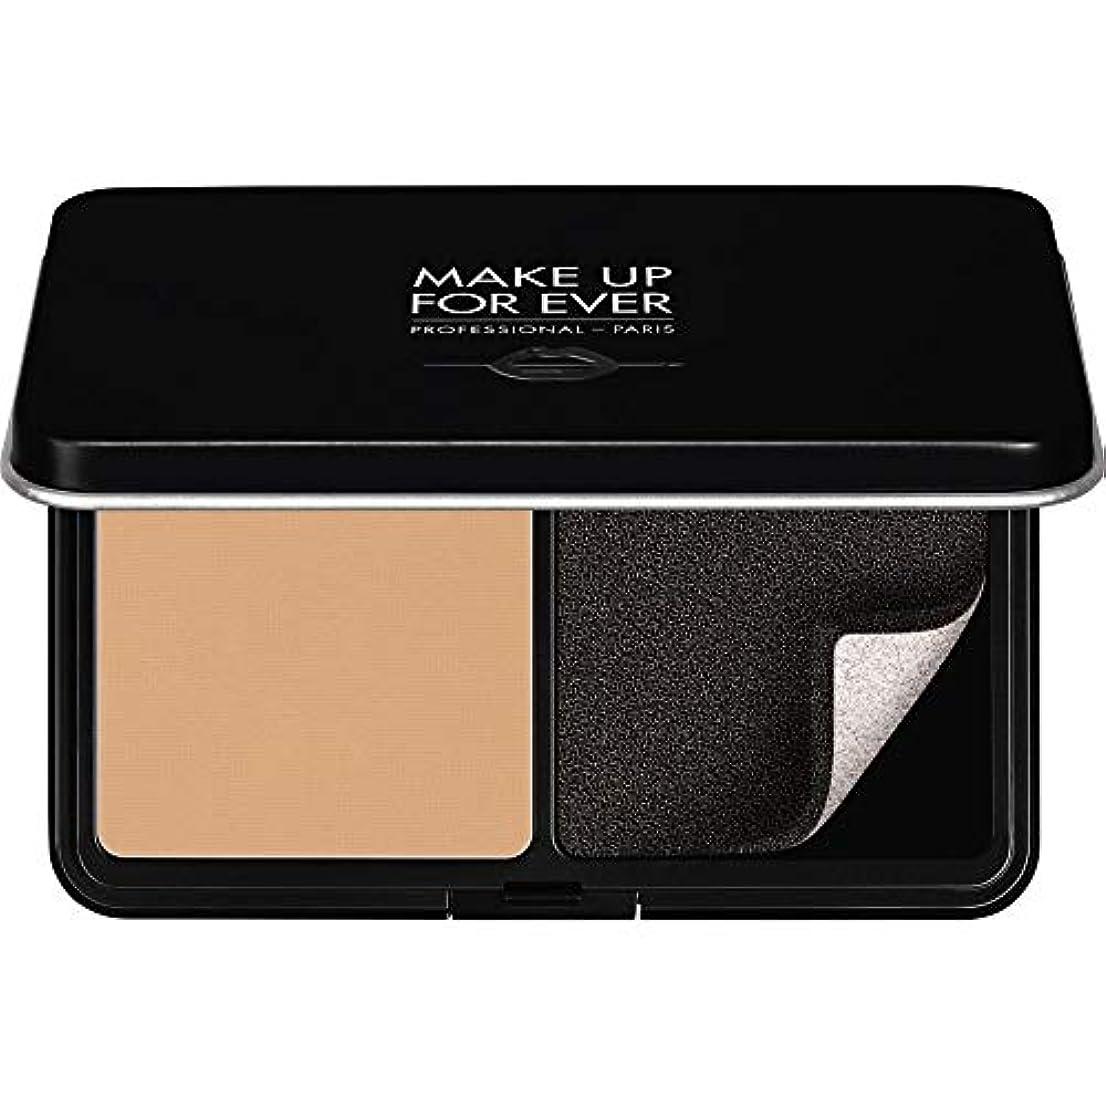 [MAKE UP FOR EVER ] パウダーファンデーション11GののY305をぼかし、これまでマットベルベットの肌を補う - ソフトベージュ - MAKE UP FOR EVER Matte Velvet Skin...